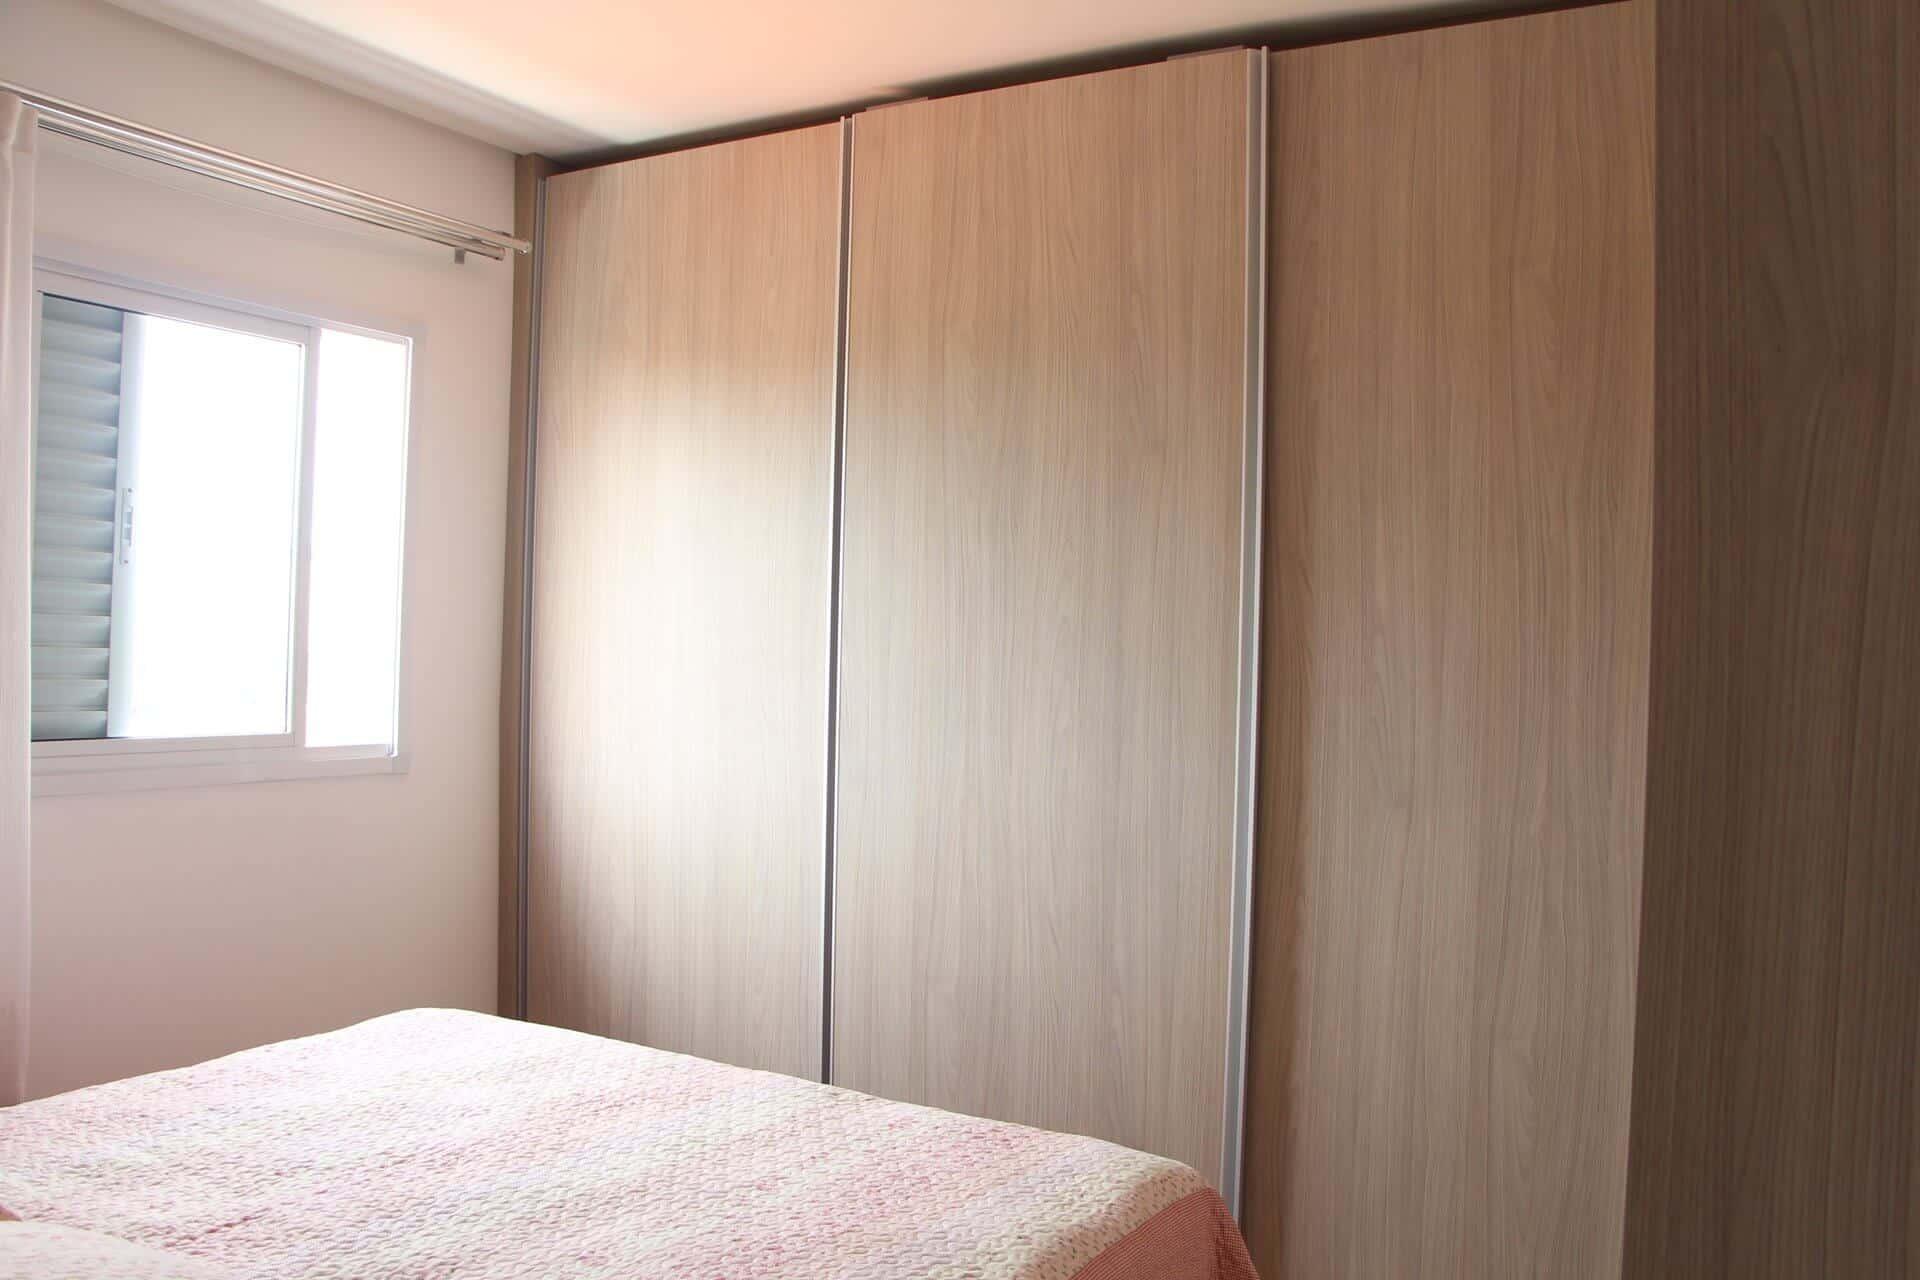 dormitorio-planejado_moveis-sob-medida-galeria-79